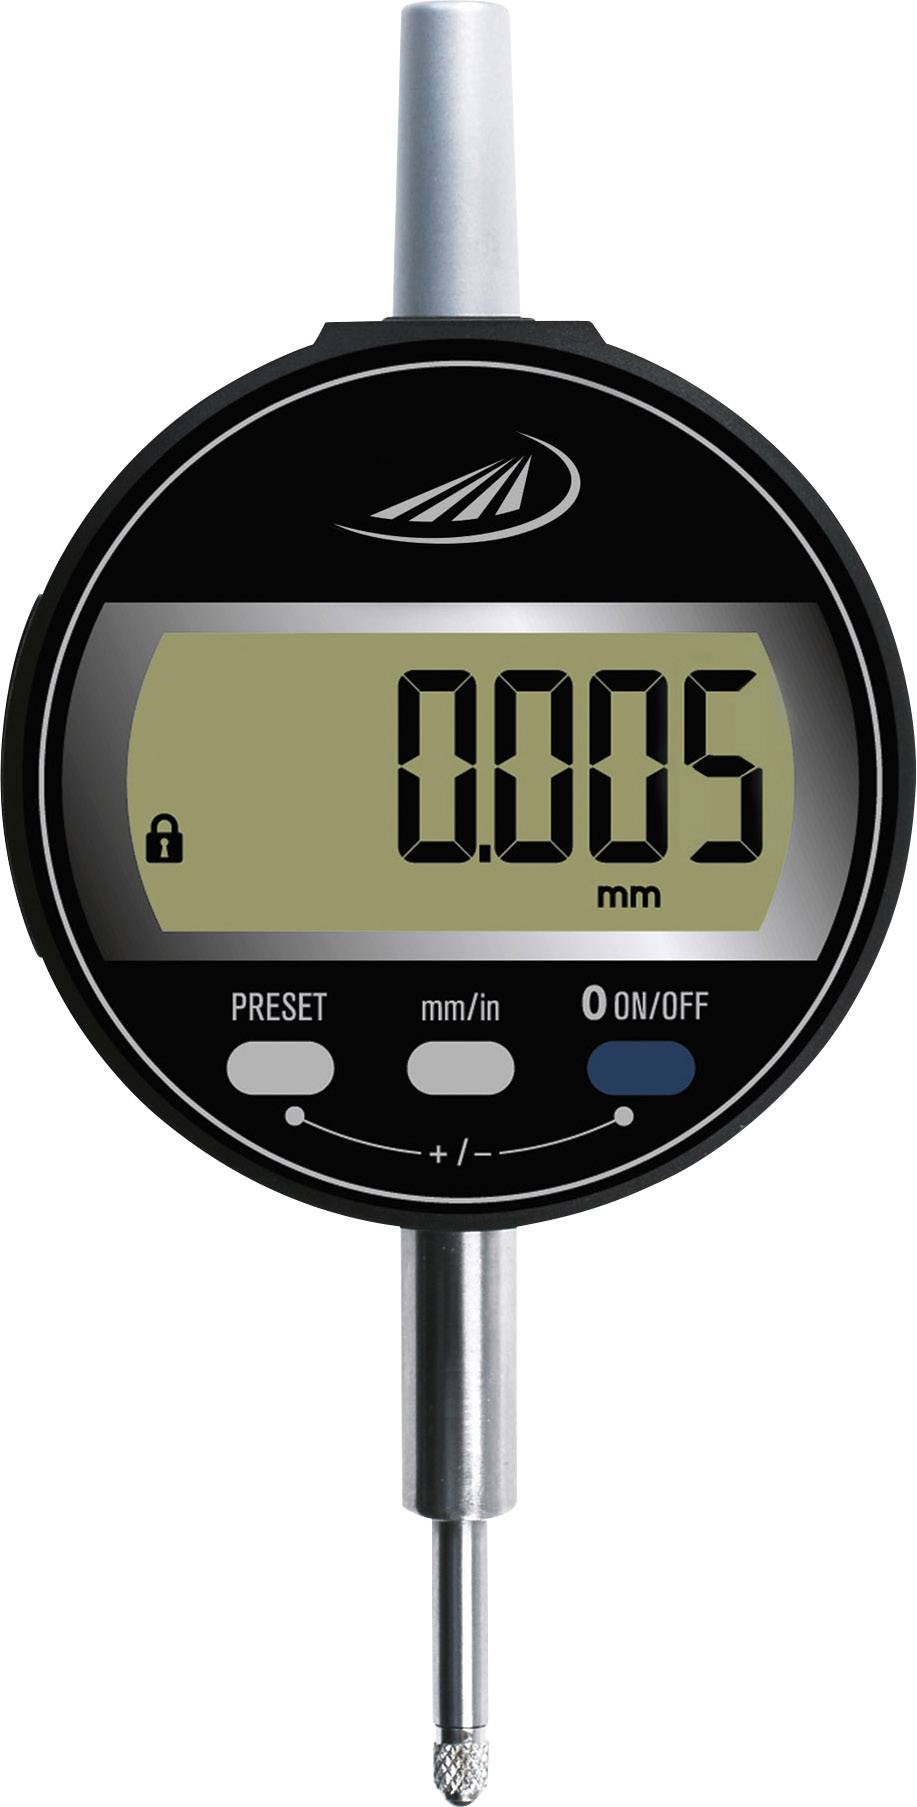 Digitálne meradlo Helios Preisser 1723 502, 0.005 mm